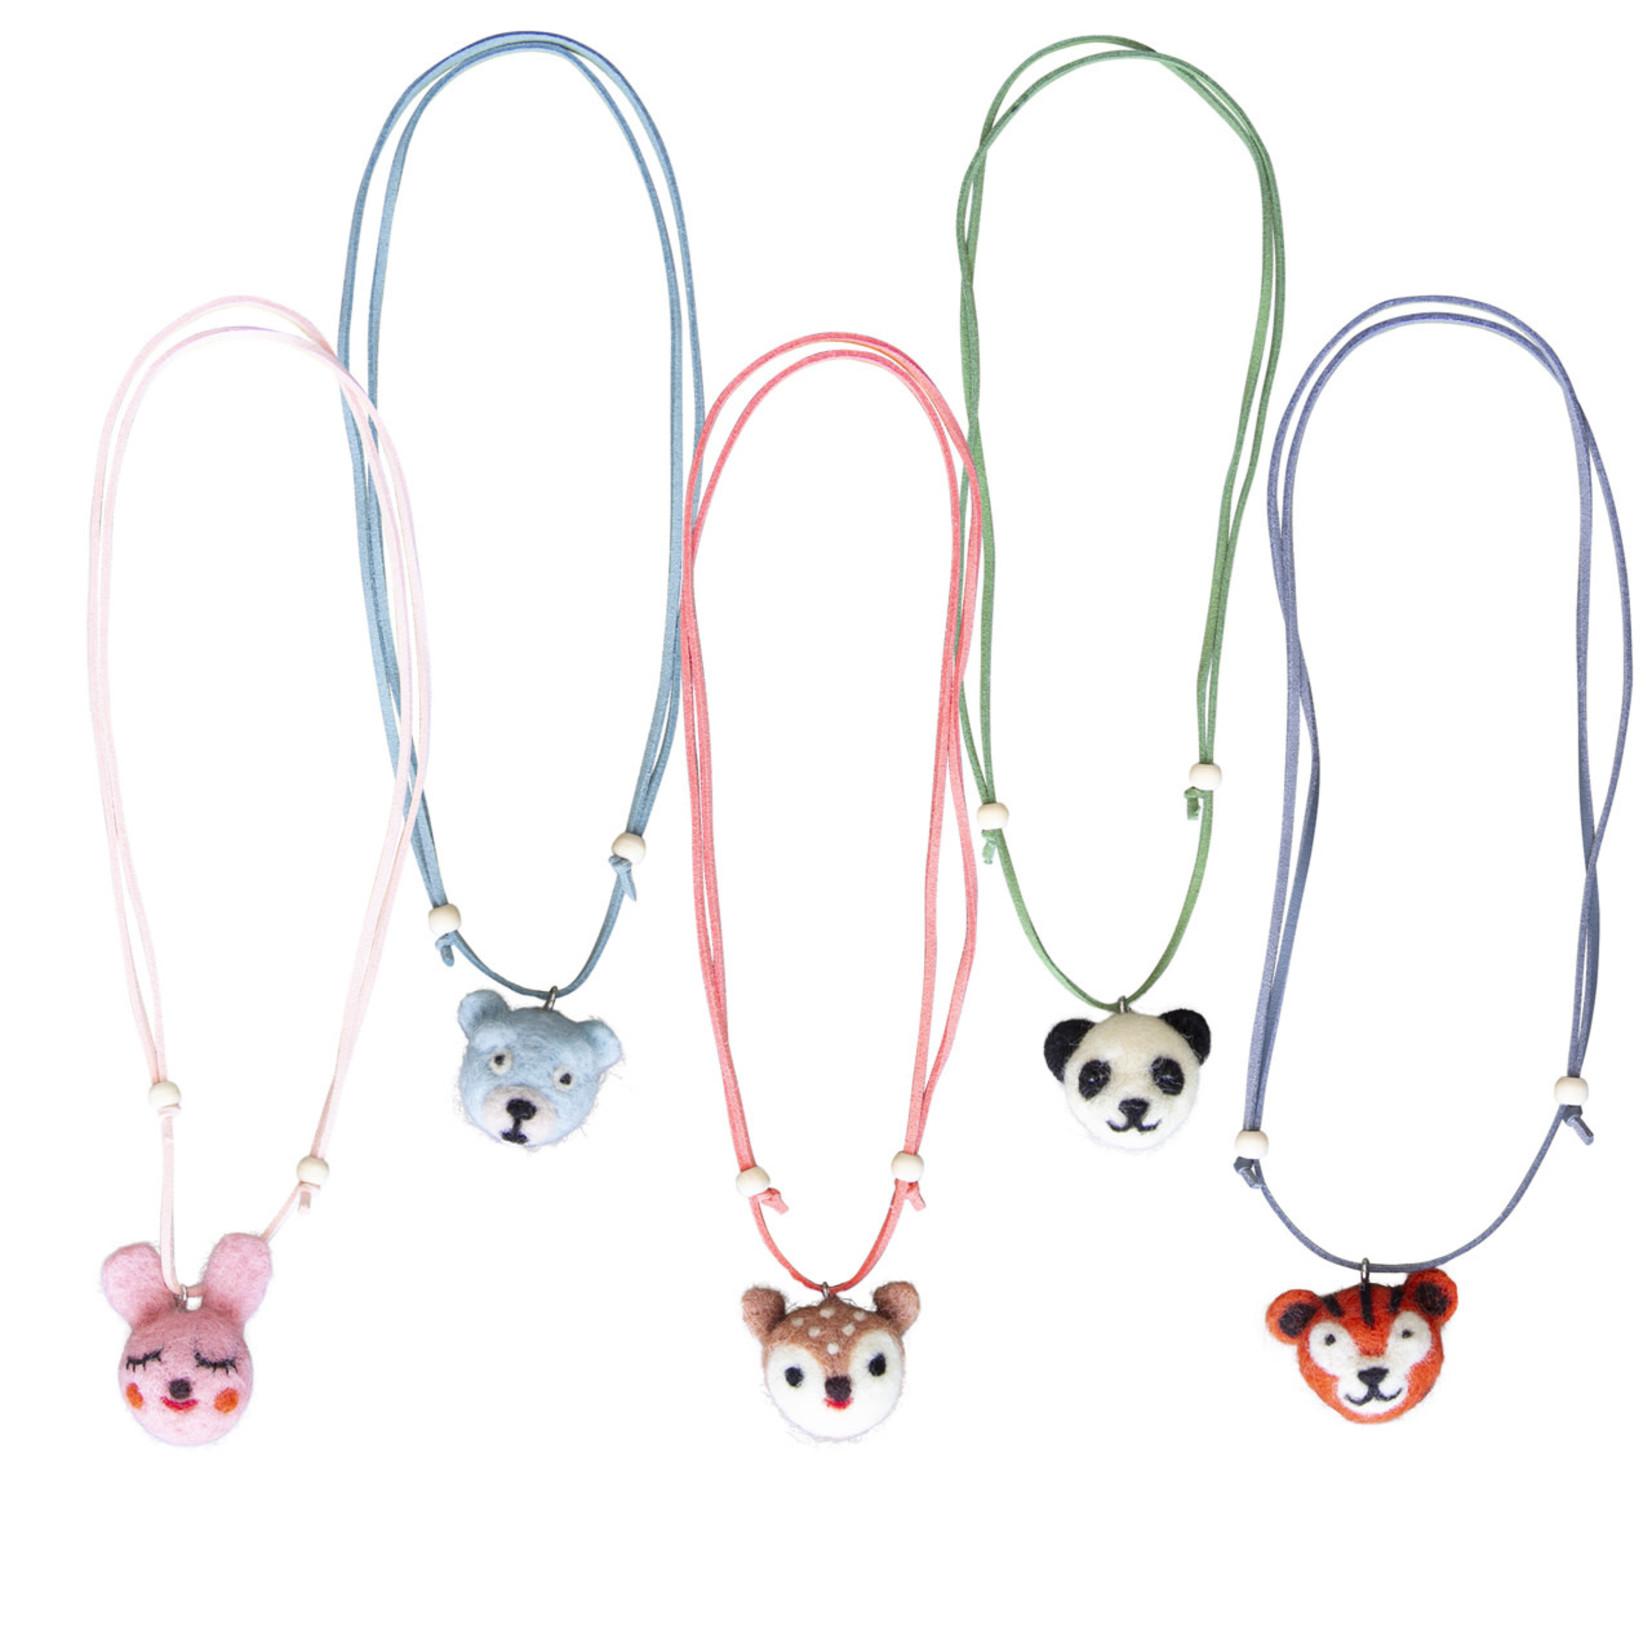 GLOBAL AFFAIRS GLOBAL AFFAIRS necklace  bear